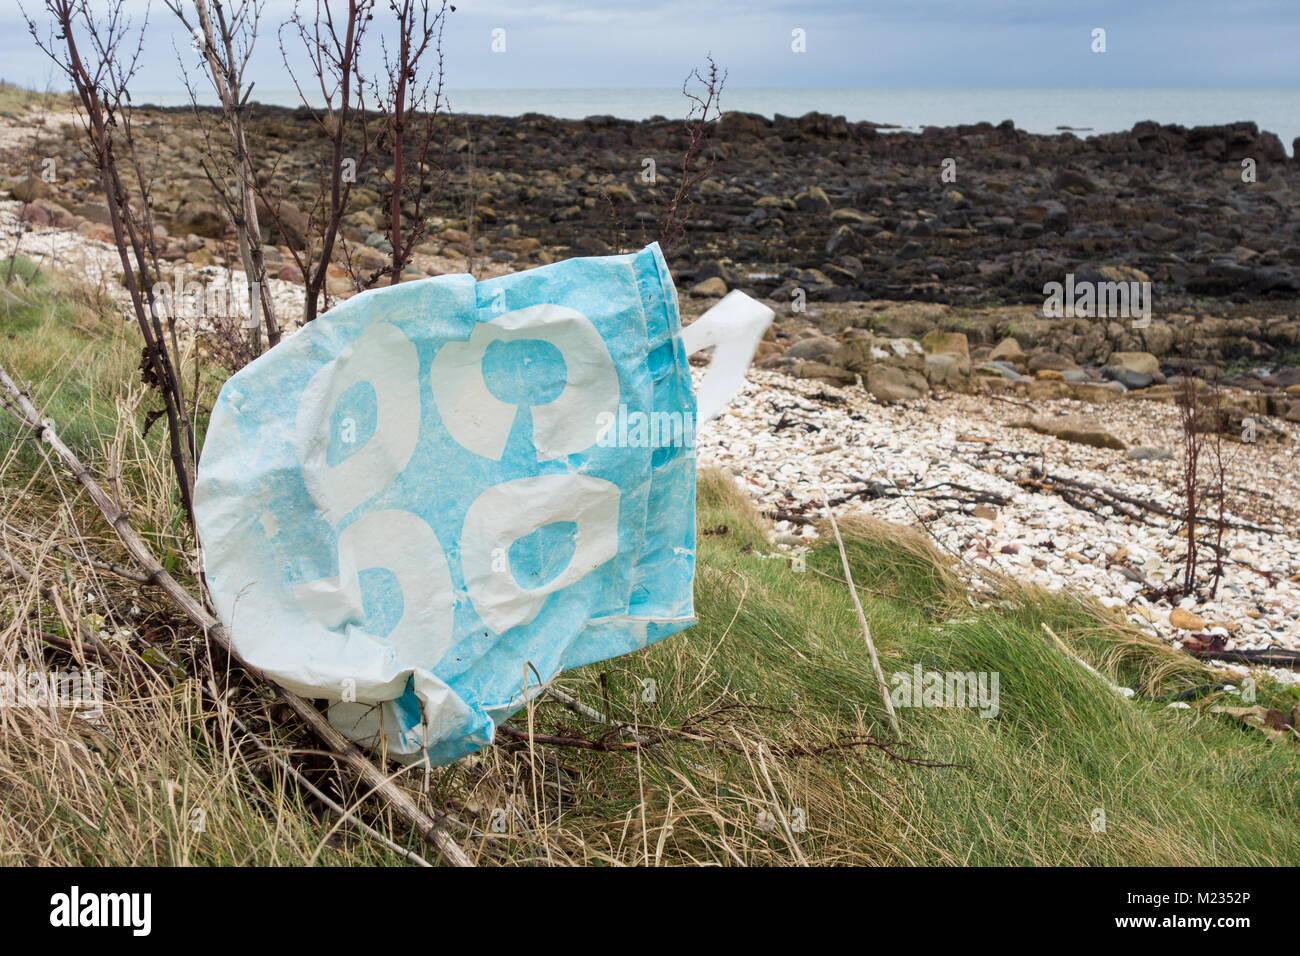 Coop supermarket reusable bag for life litter, UK - Stock Image